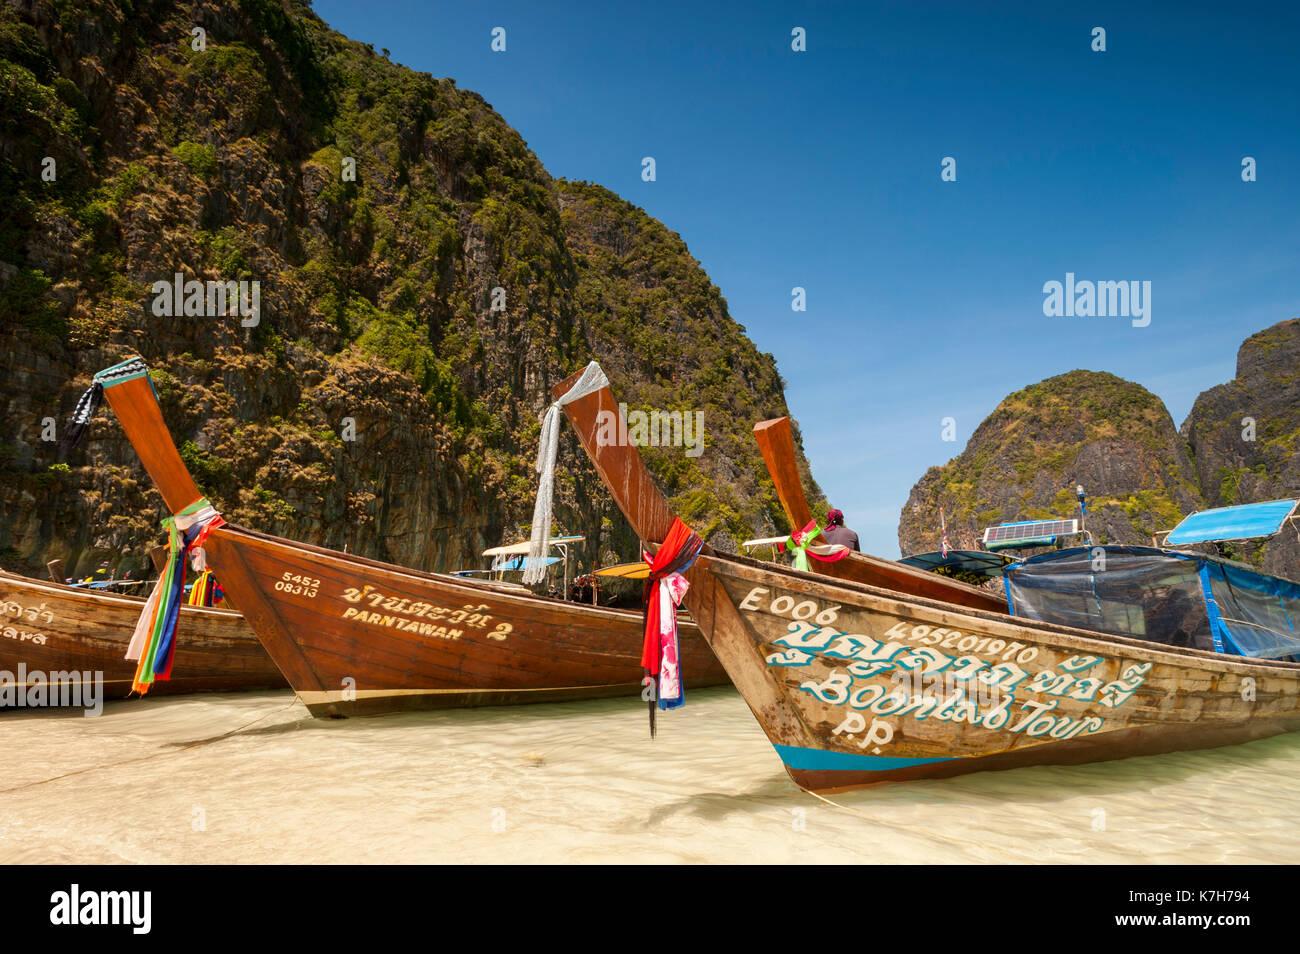 Long-tail boats in Maya Bay, Phi Phi Islands, Thailand. - Stock Image